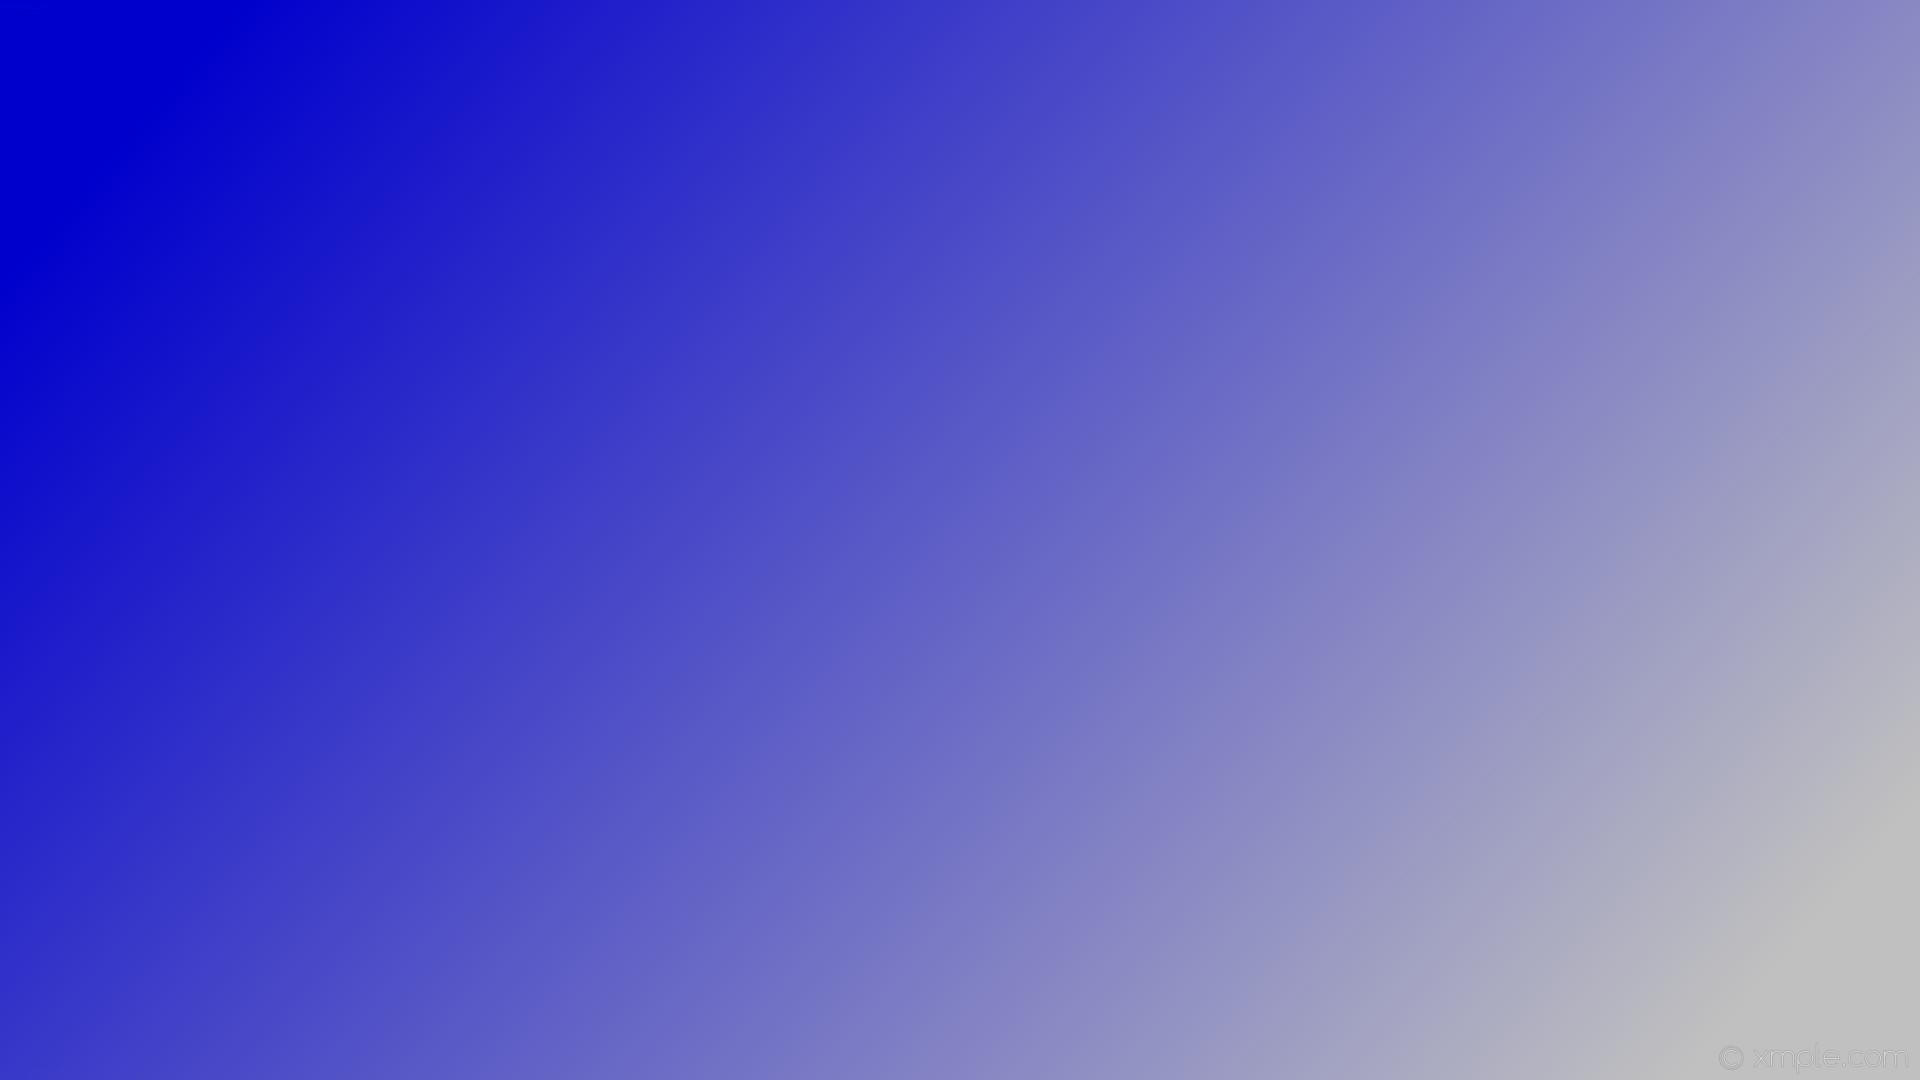 wallpaper blue gradient grey linear medium blue silver #0000cd #c0c0c0 165°